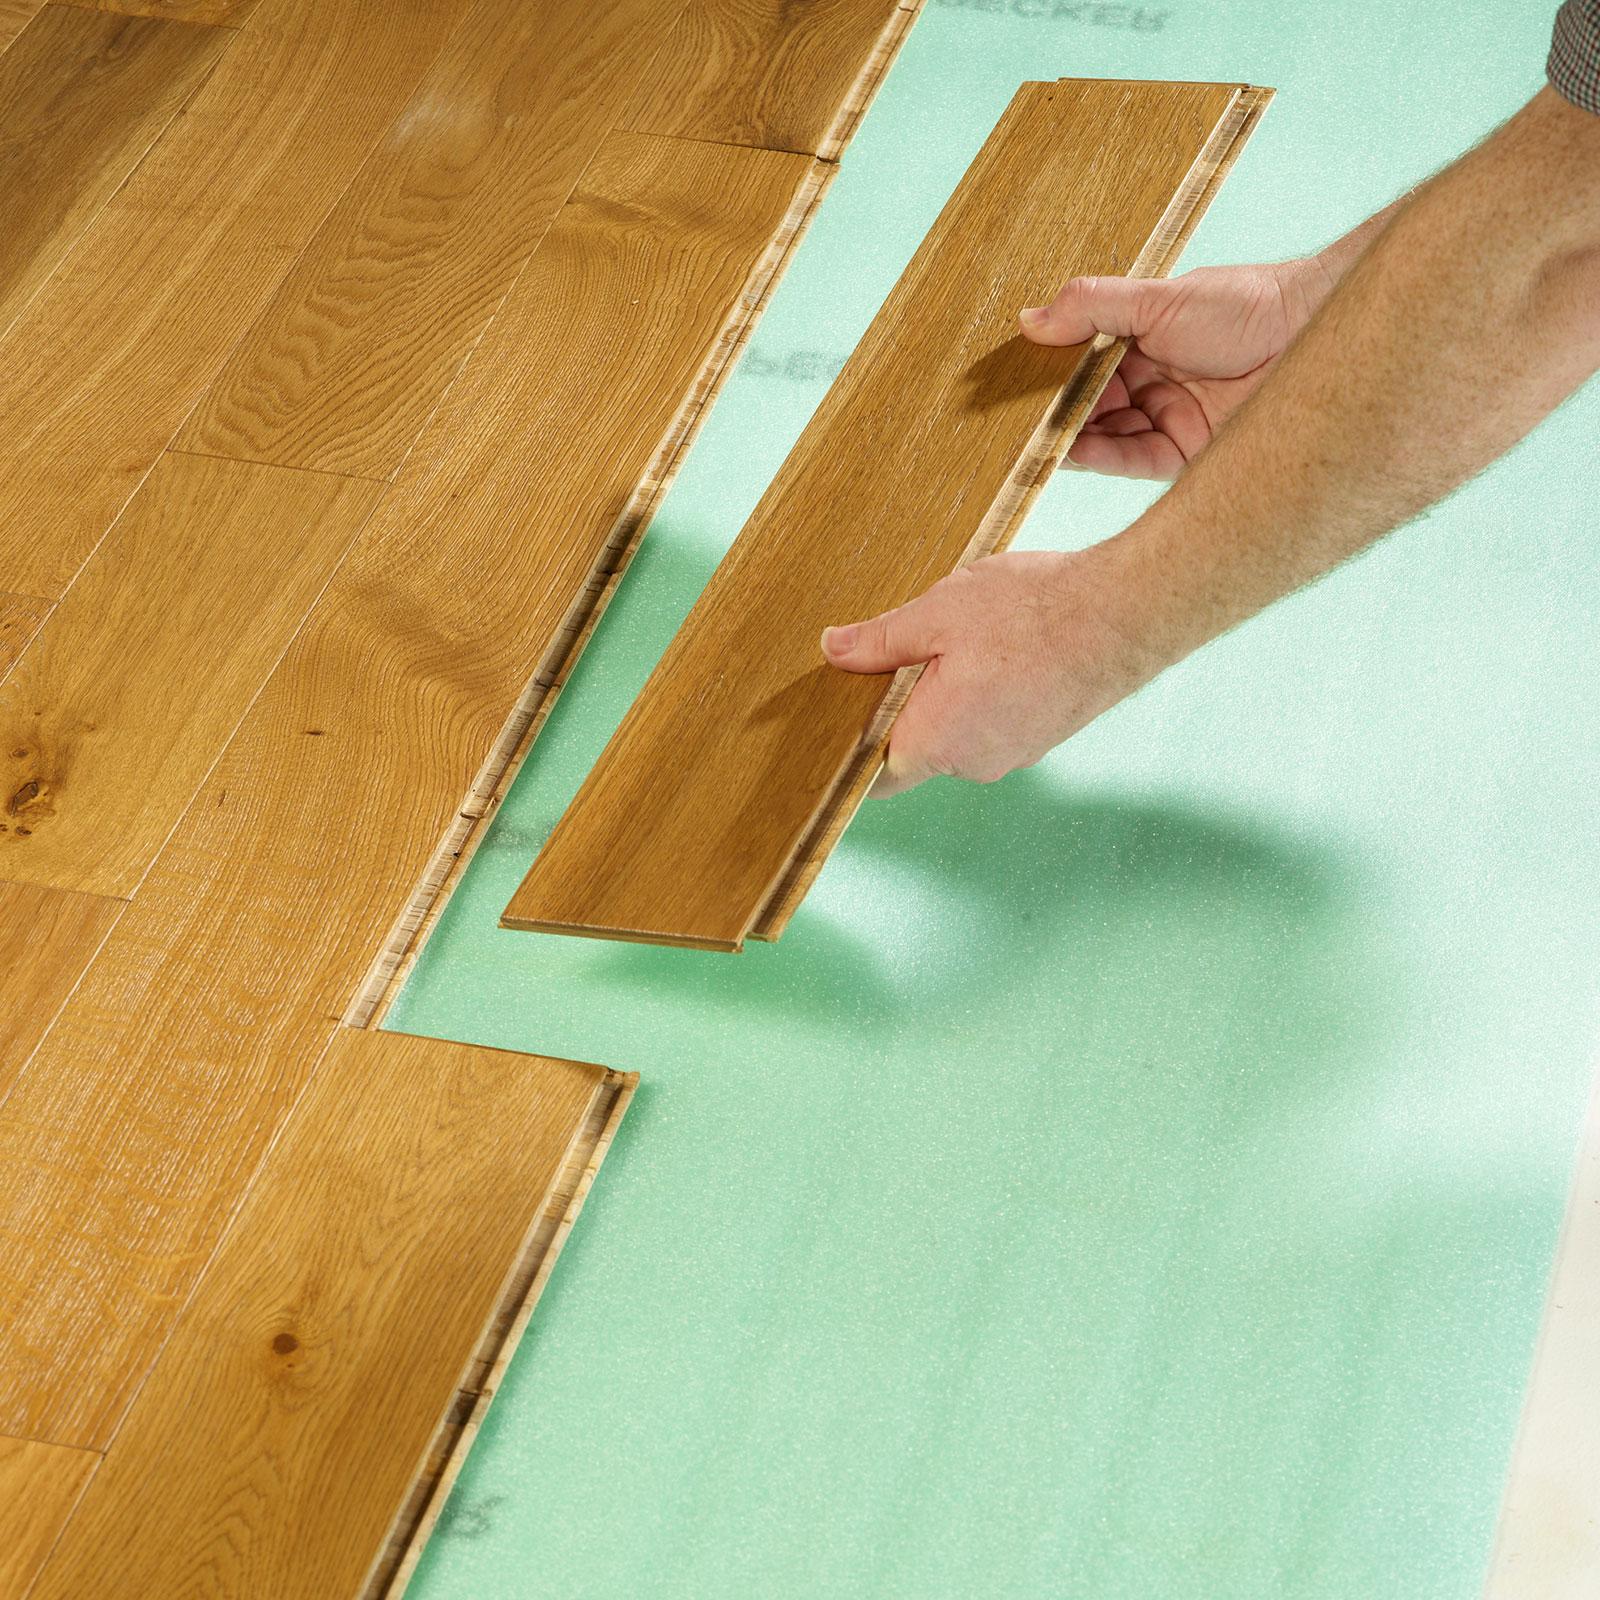 fitting wood flooring